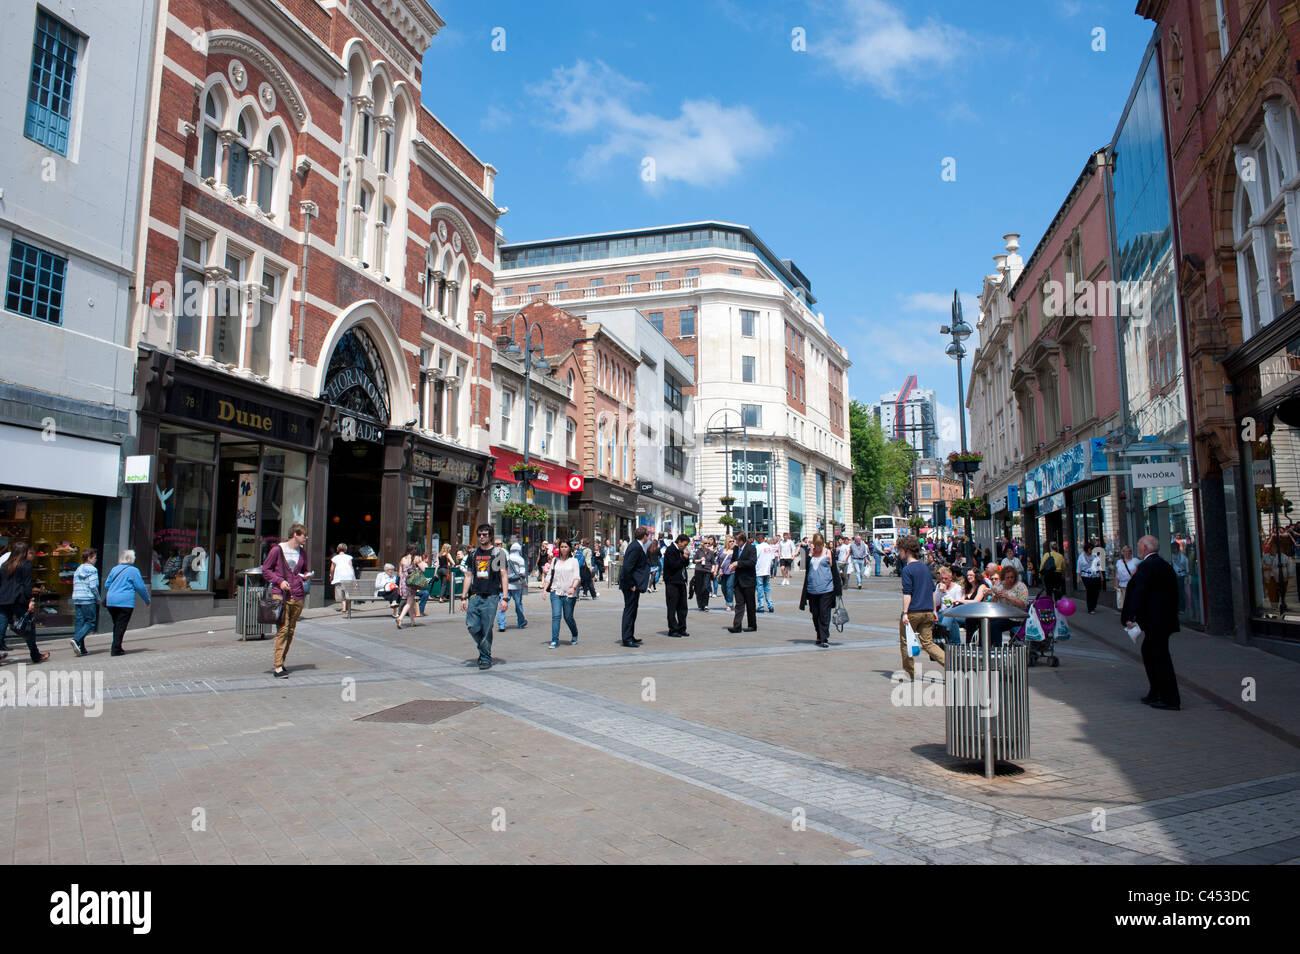 Briggate, Leeds - Stock Image